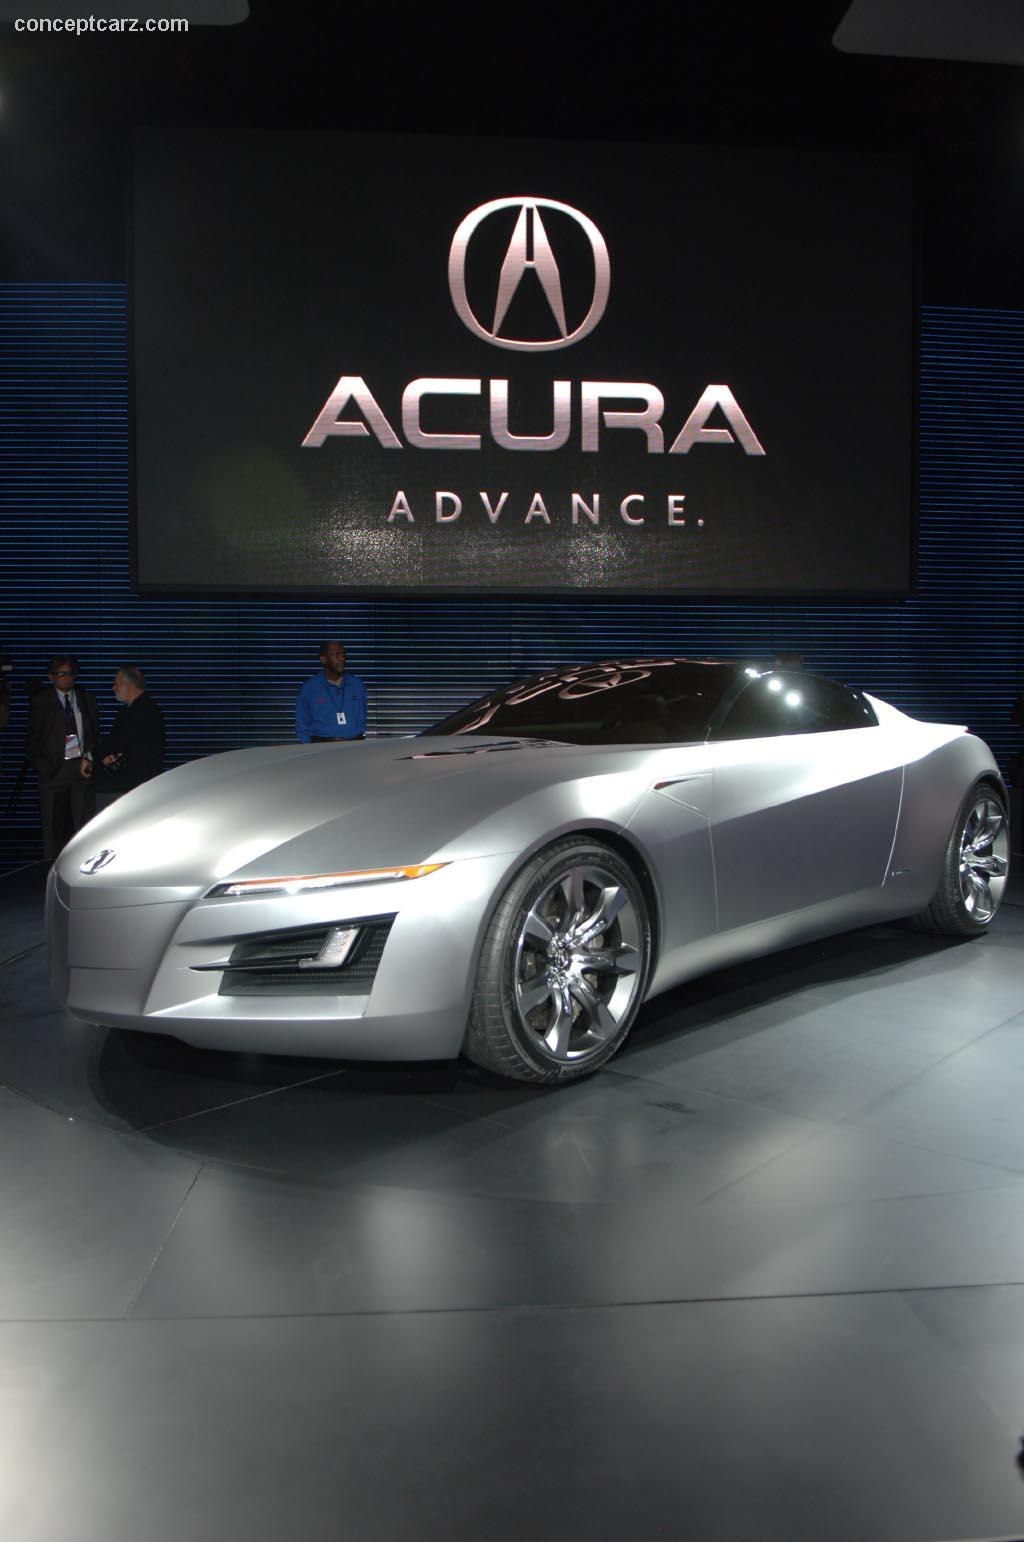 2007 acura advanced sports car concept image. Black Bedroom Furniture Sets. Home Design Ideas